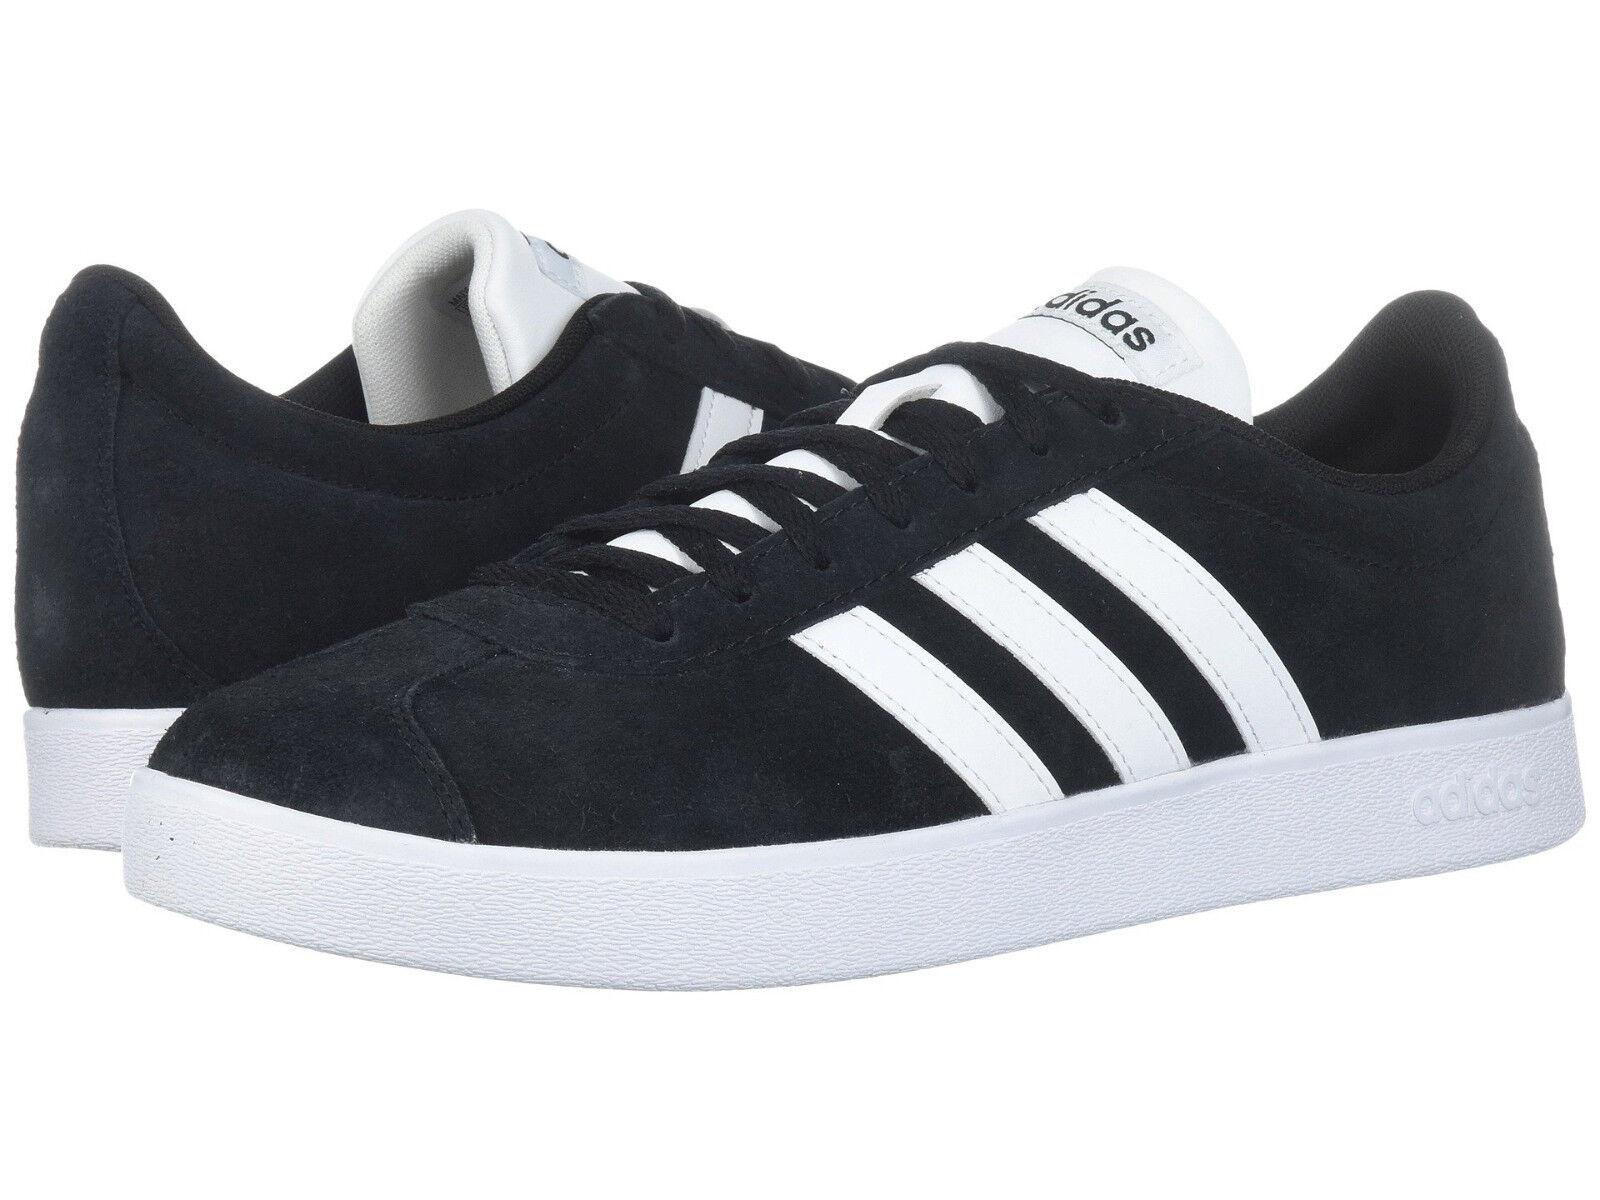 Men Adidas VL Court 2.0 Sneaker Suede DA9853 Black White 100%Authentic Brand New